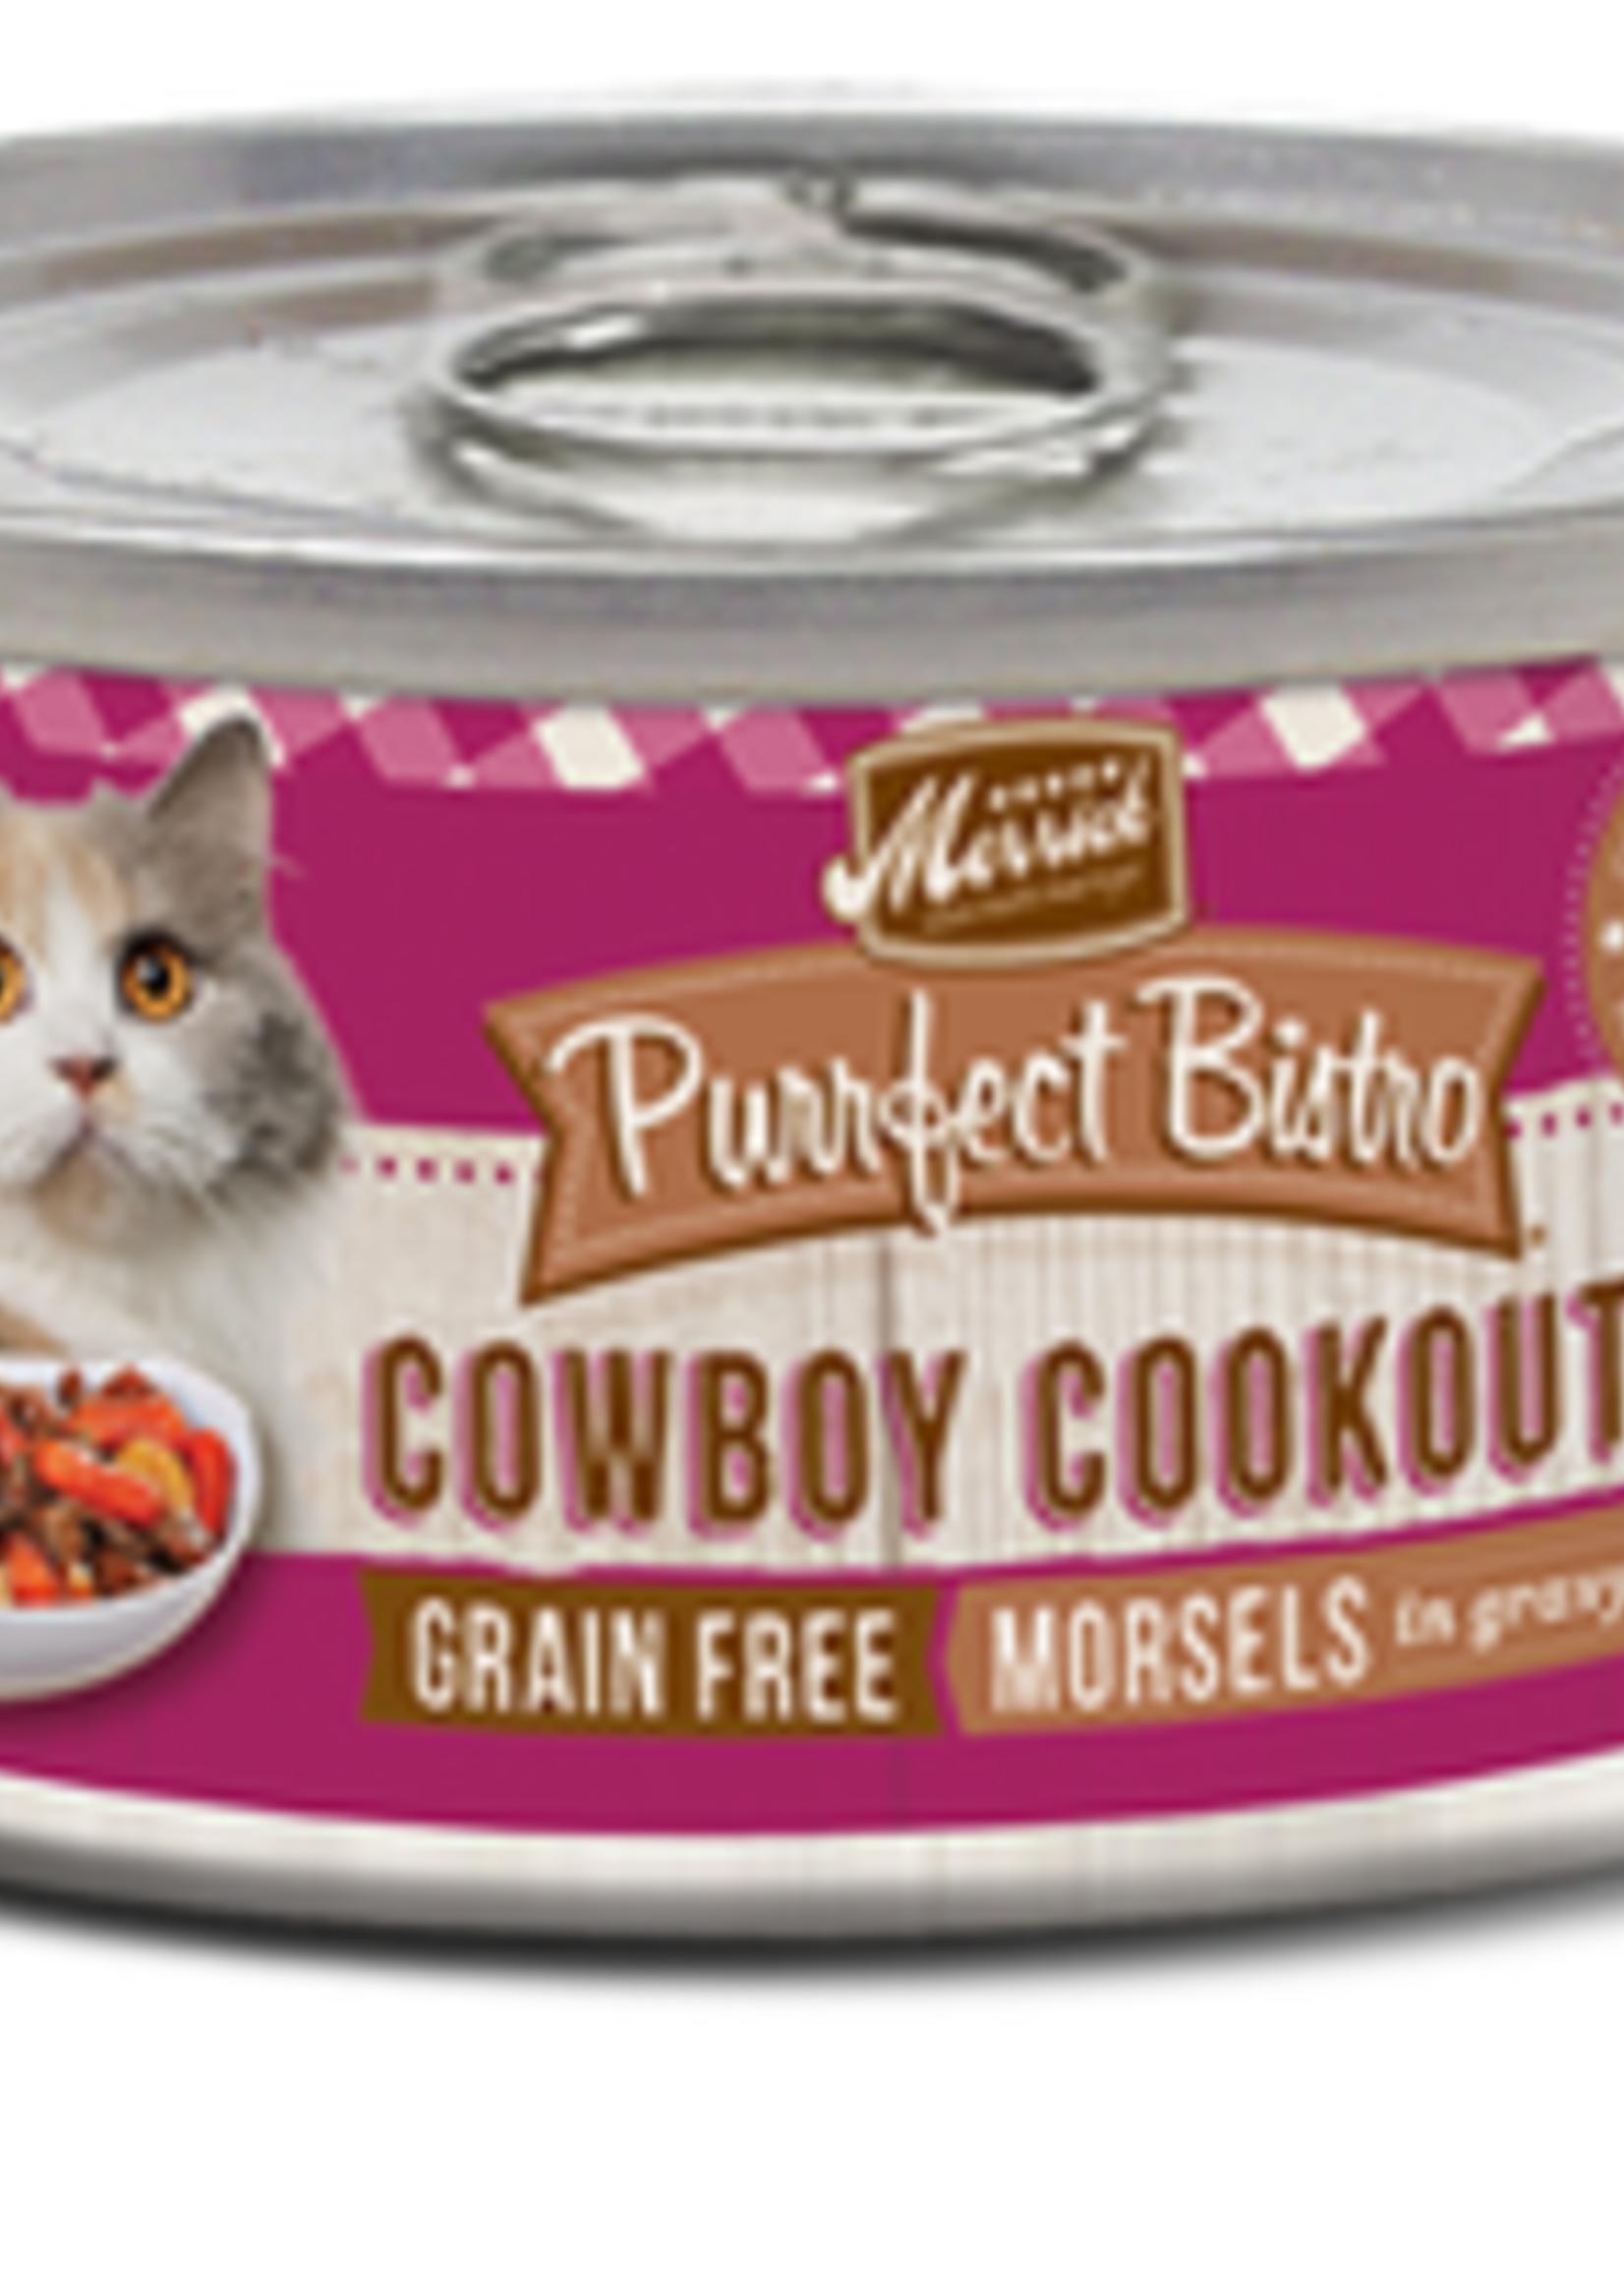 Merrick® MERRICK PURRFECT BISTRO GRAIN FREE COWBOY COOKOUT 5.5oz